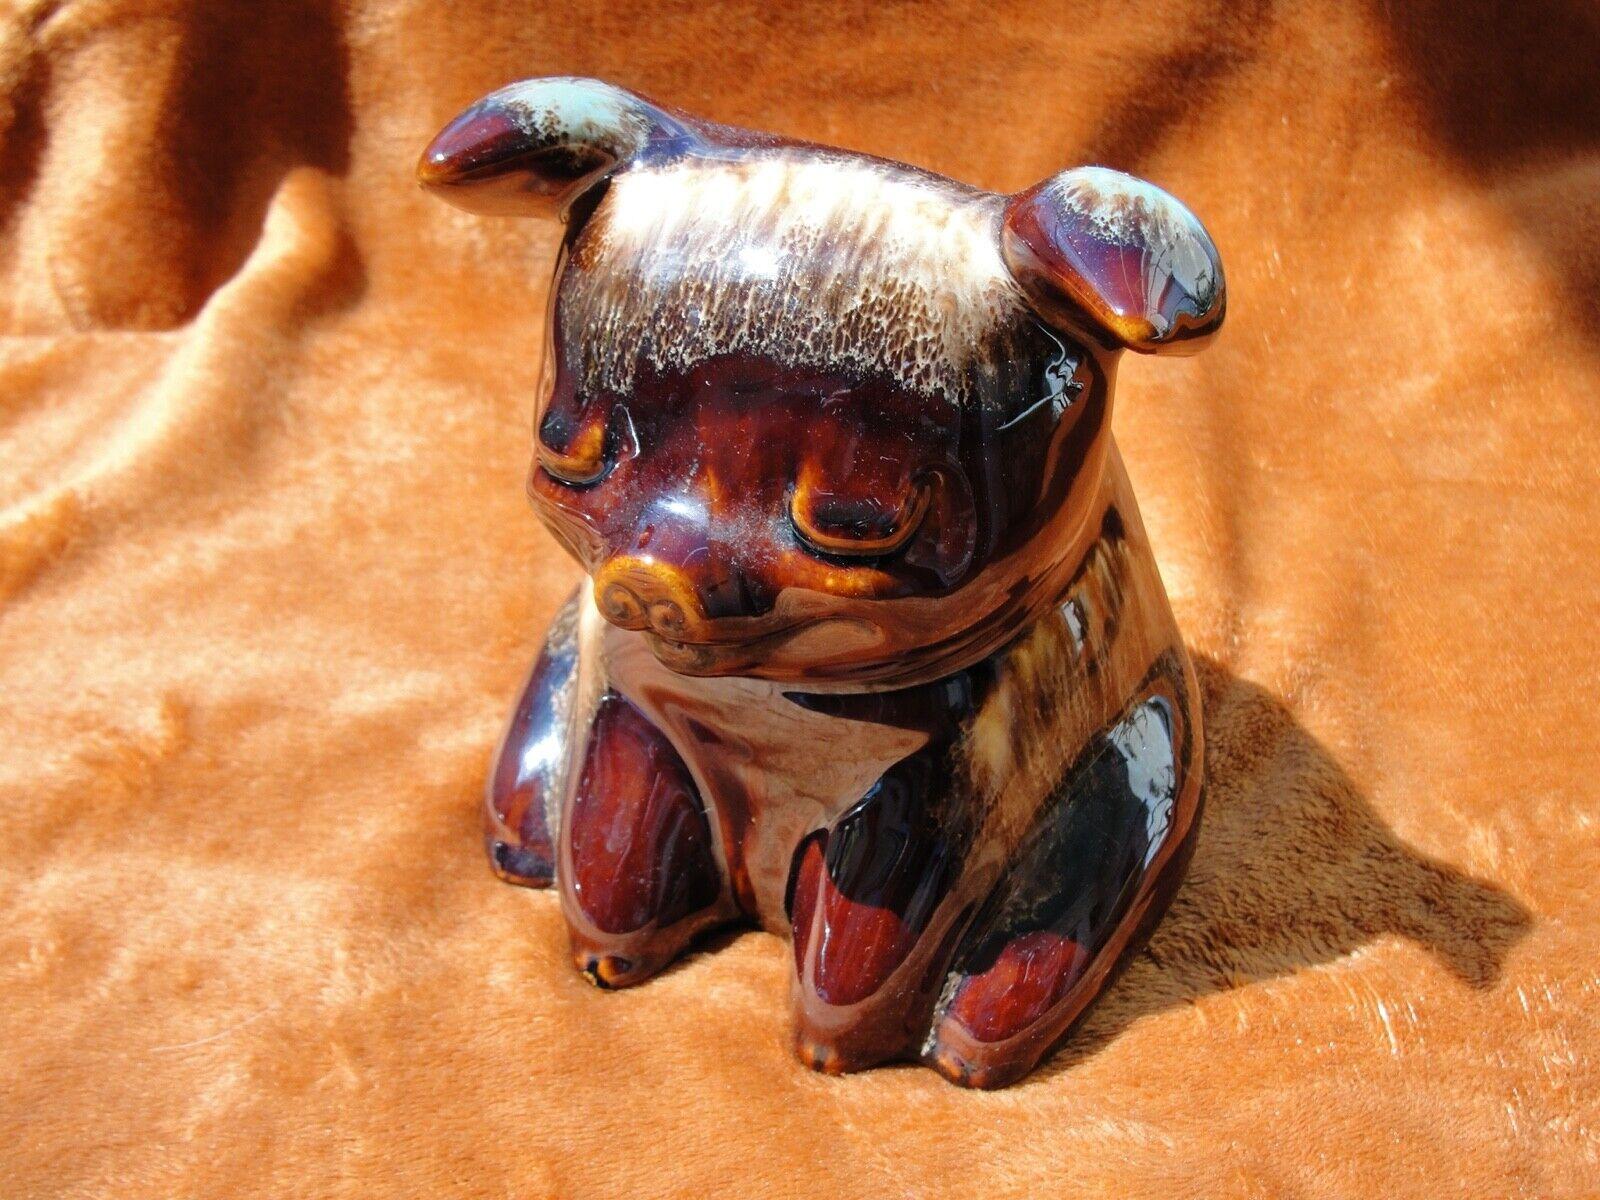 Vintage Hull Piggy Bank Ceramic Brown Drip Glaze 6 Inches USA Number 196 Glazed  - $34.00